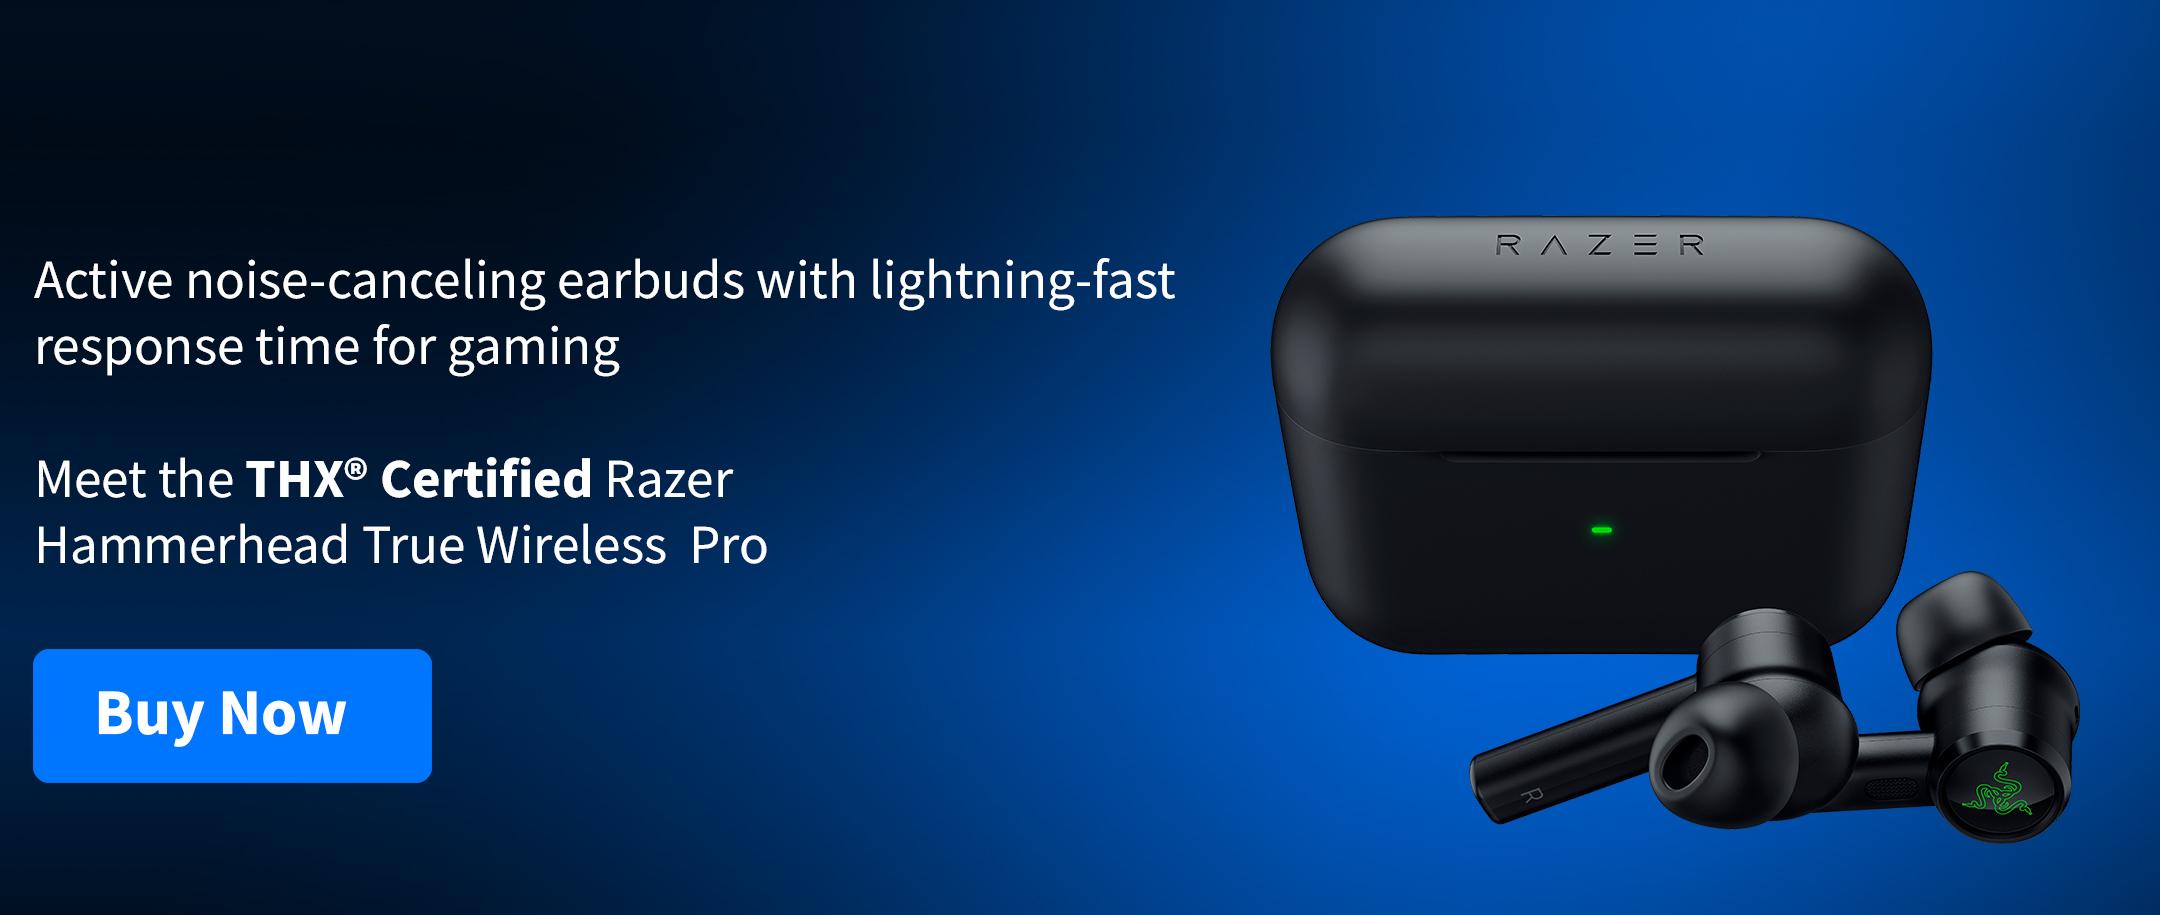 Razer Hammerhead Truewireless Pro headphones